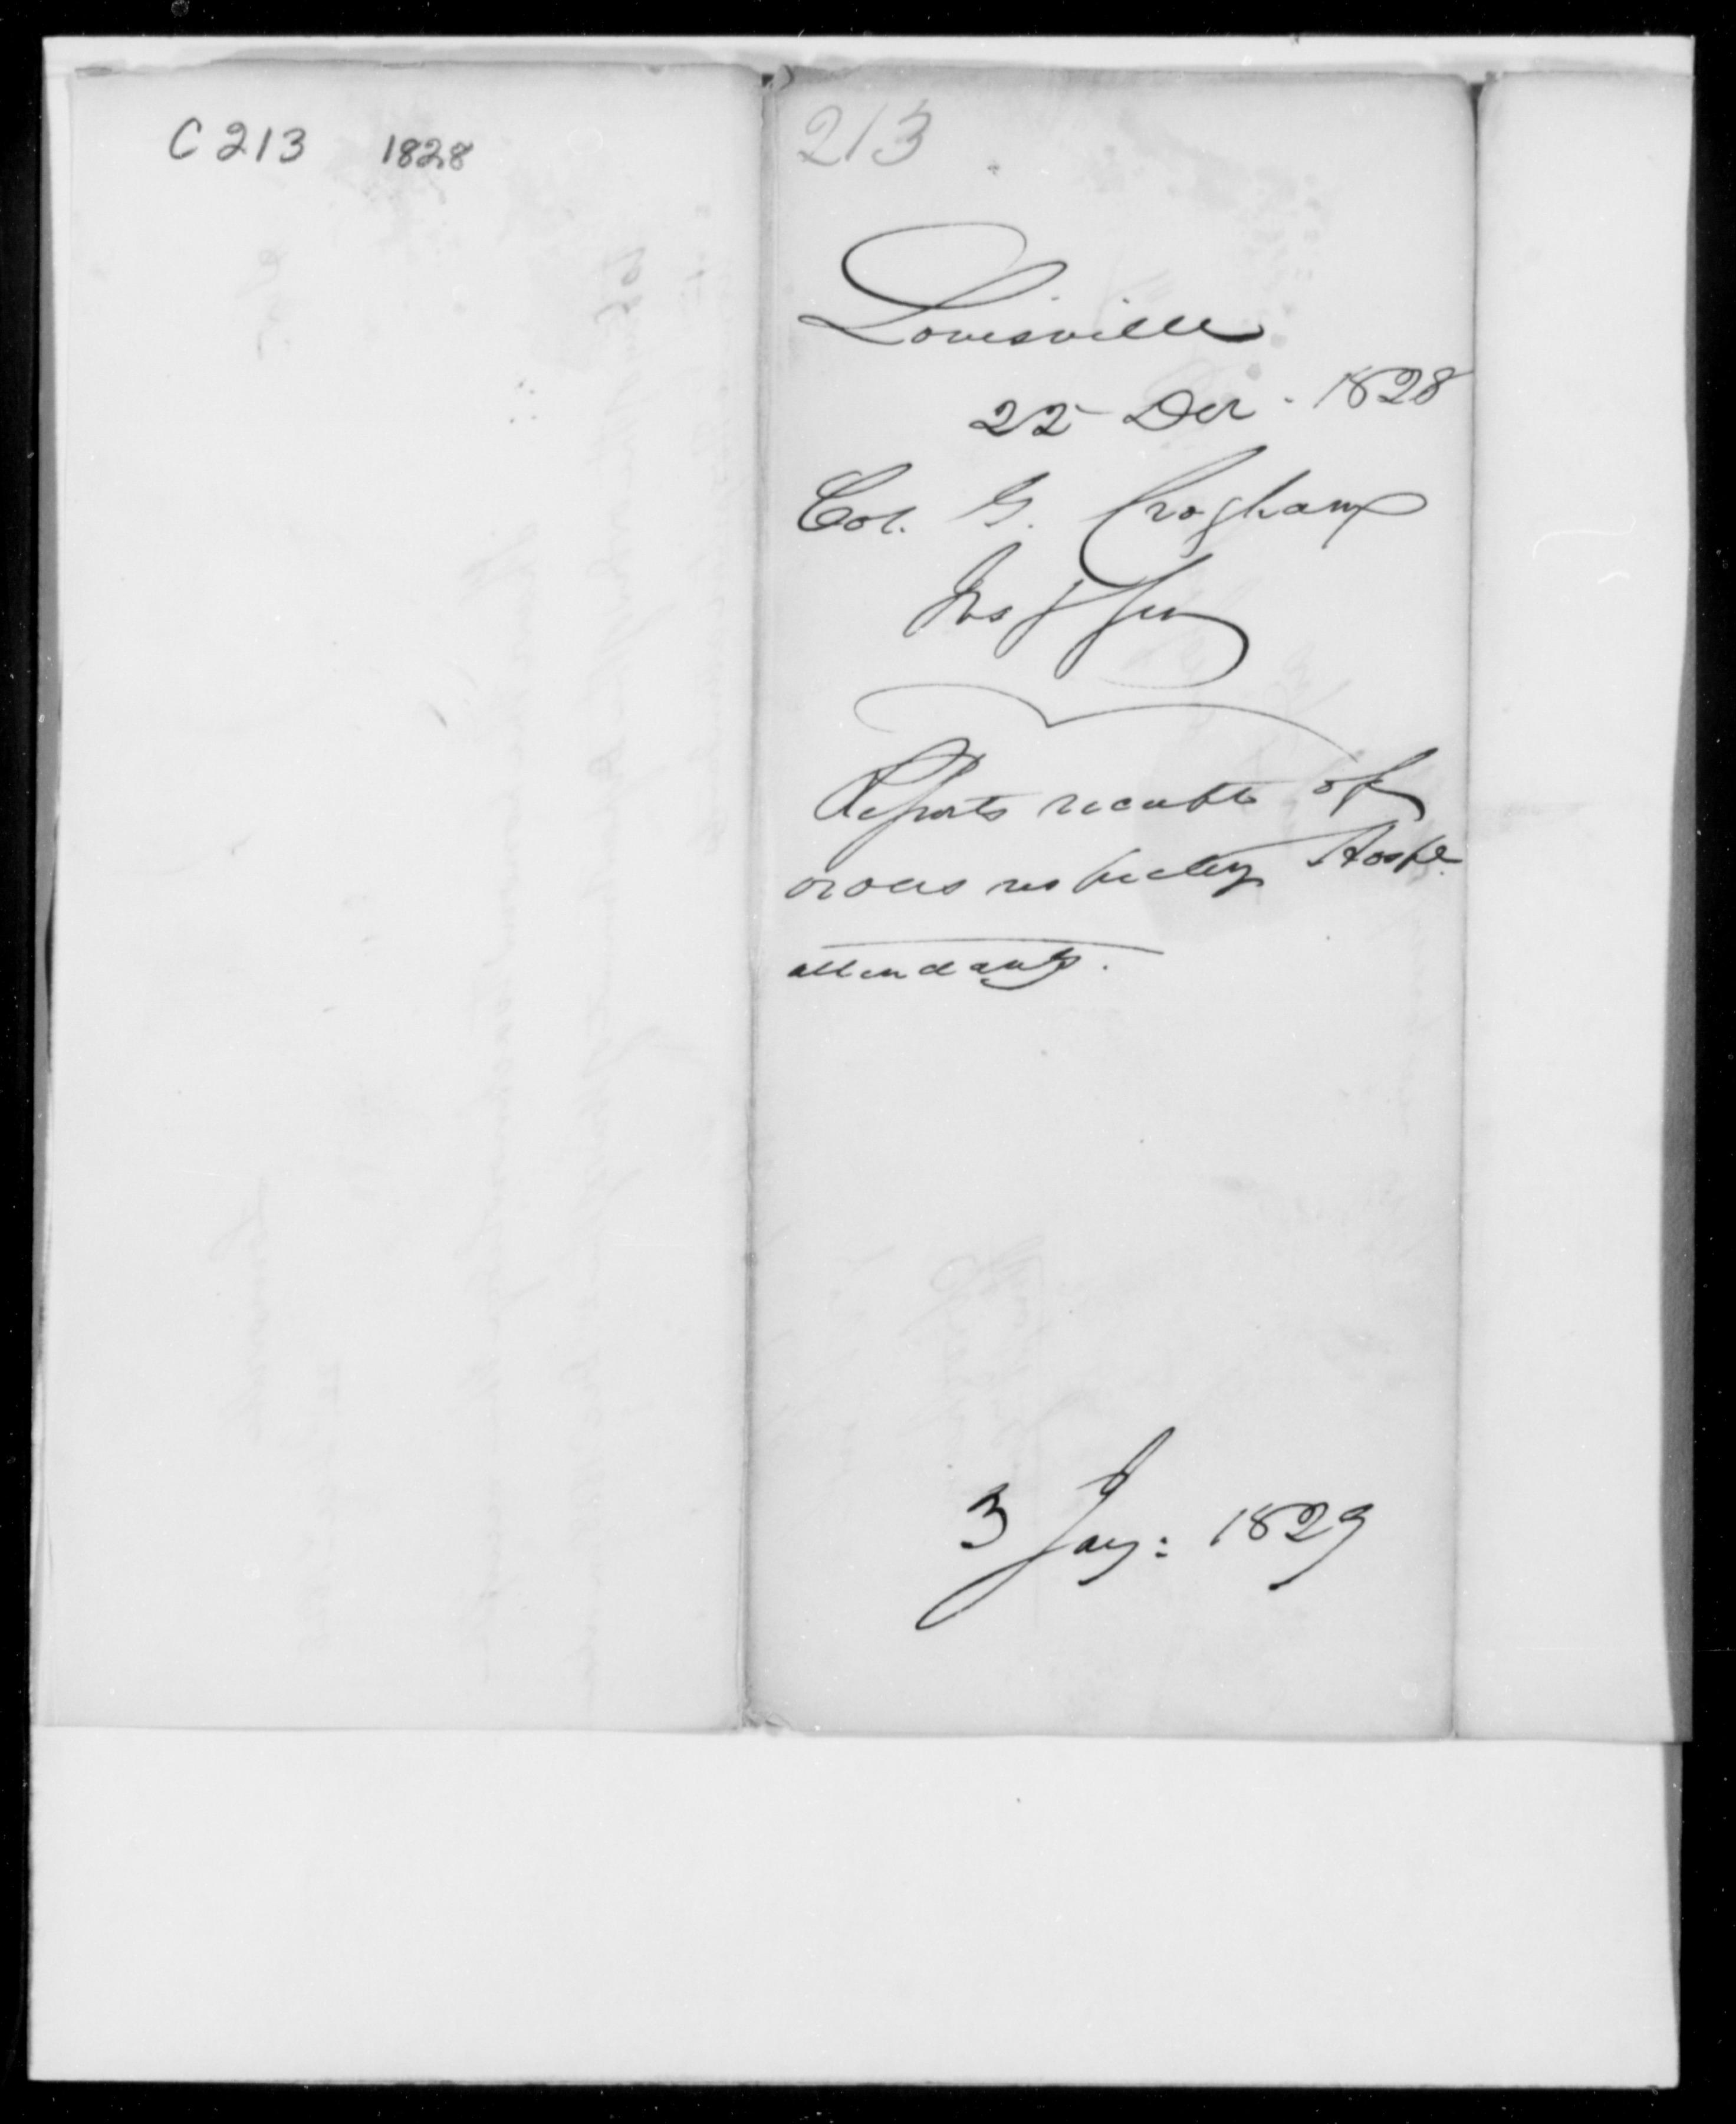 Croghan, G - Kentucky - 1828 - File No. C213